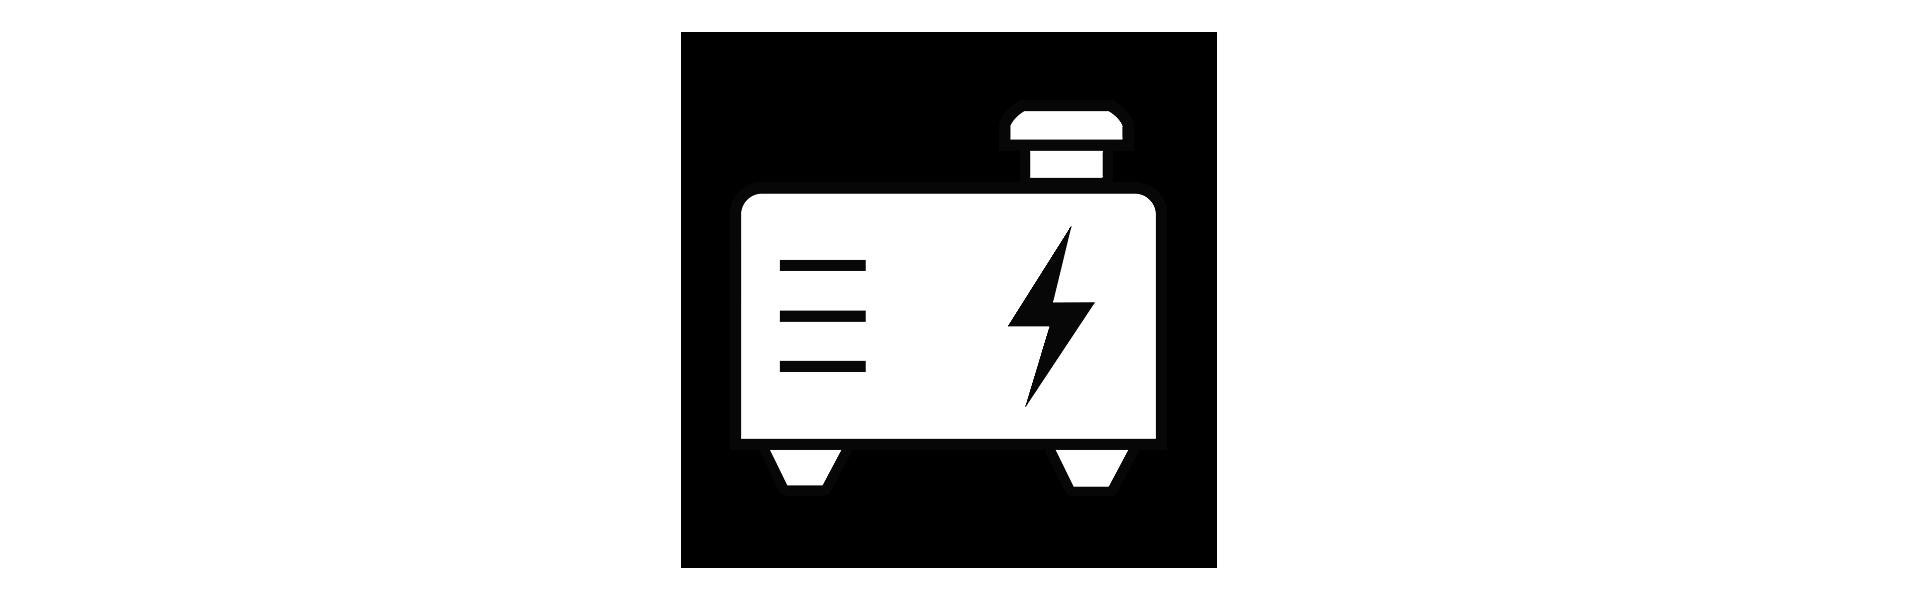 generator icon-1